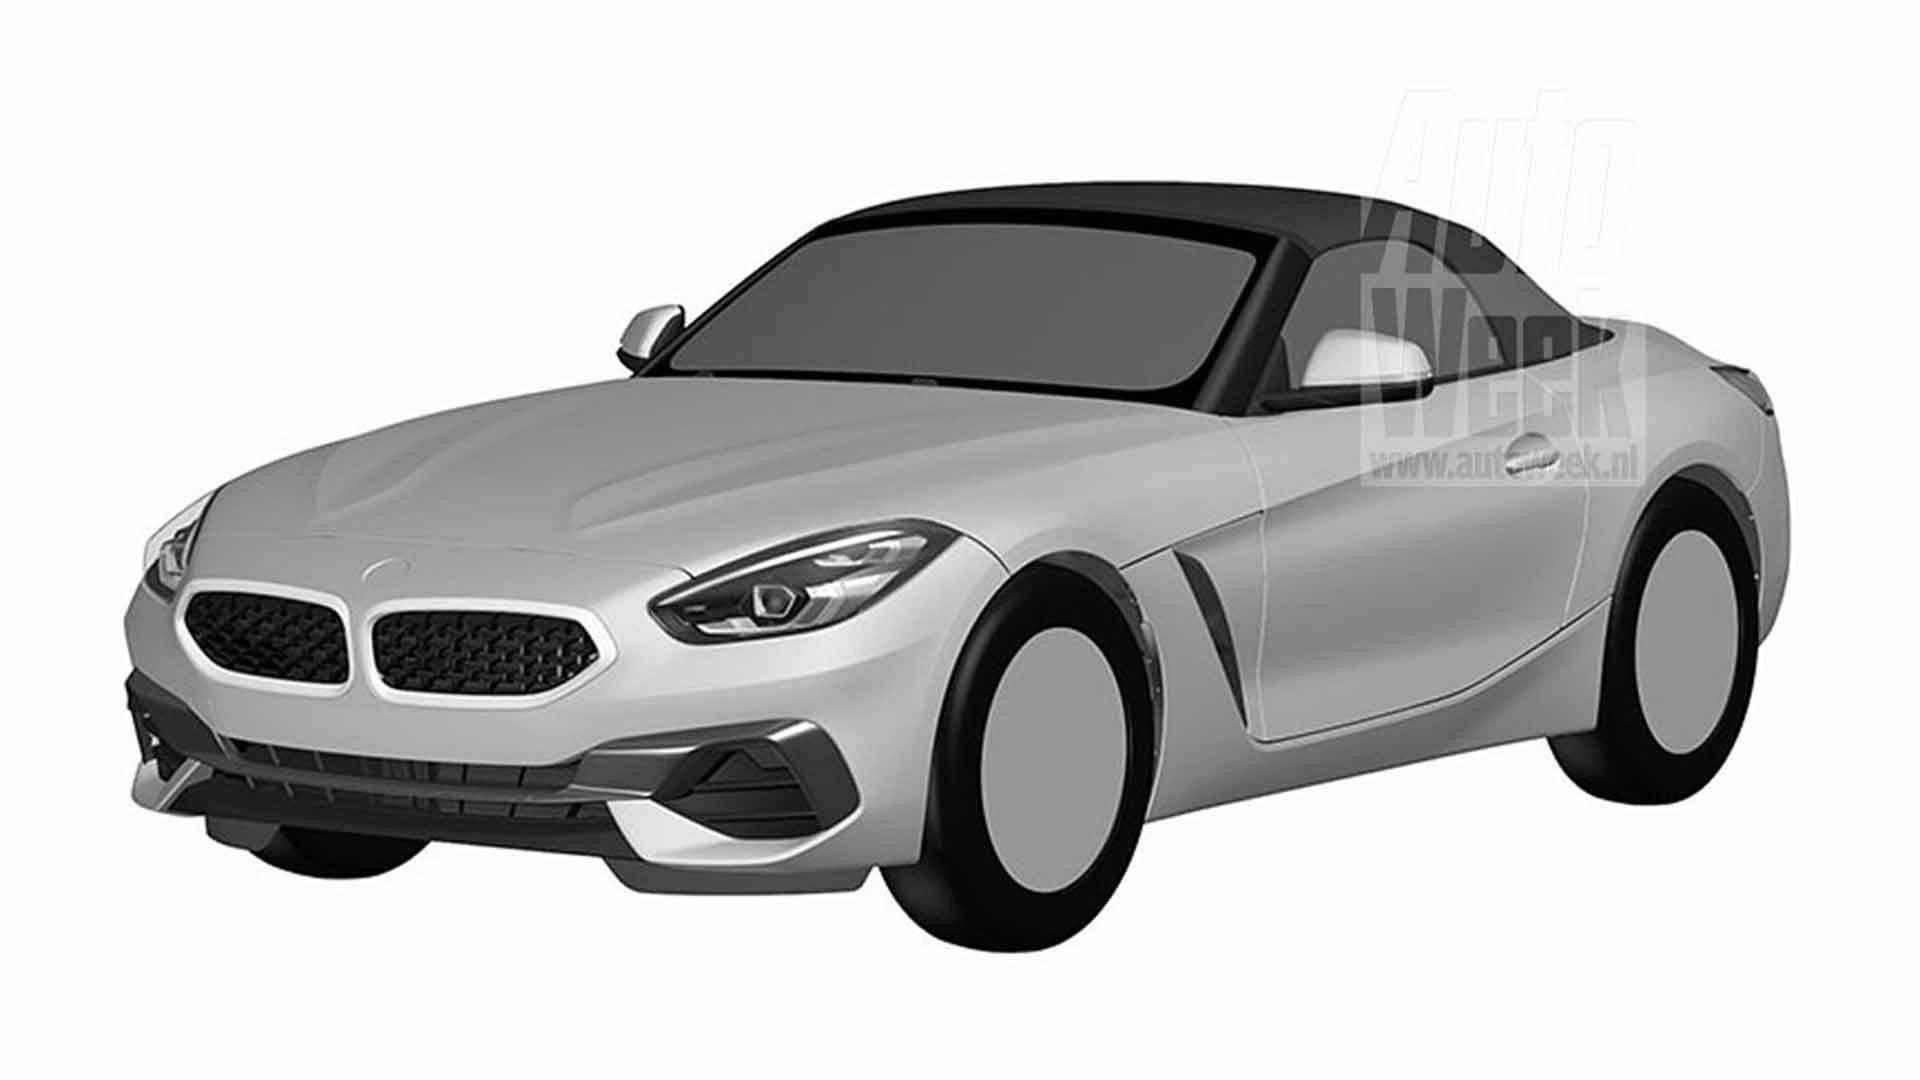 BMW Z4 Design Registration sketches (2)